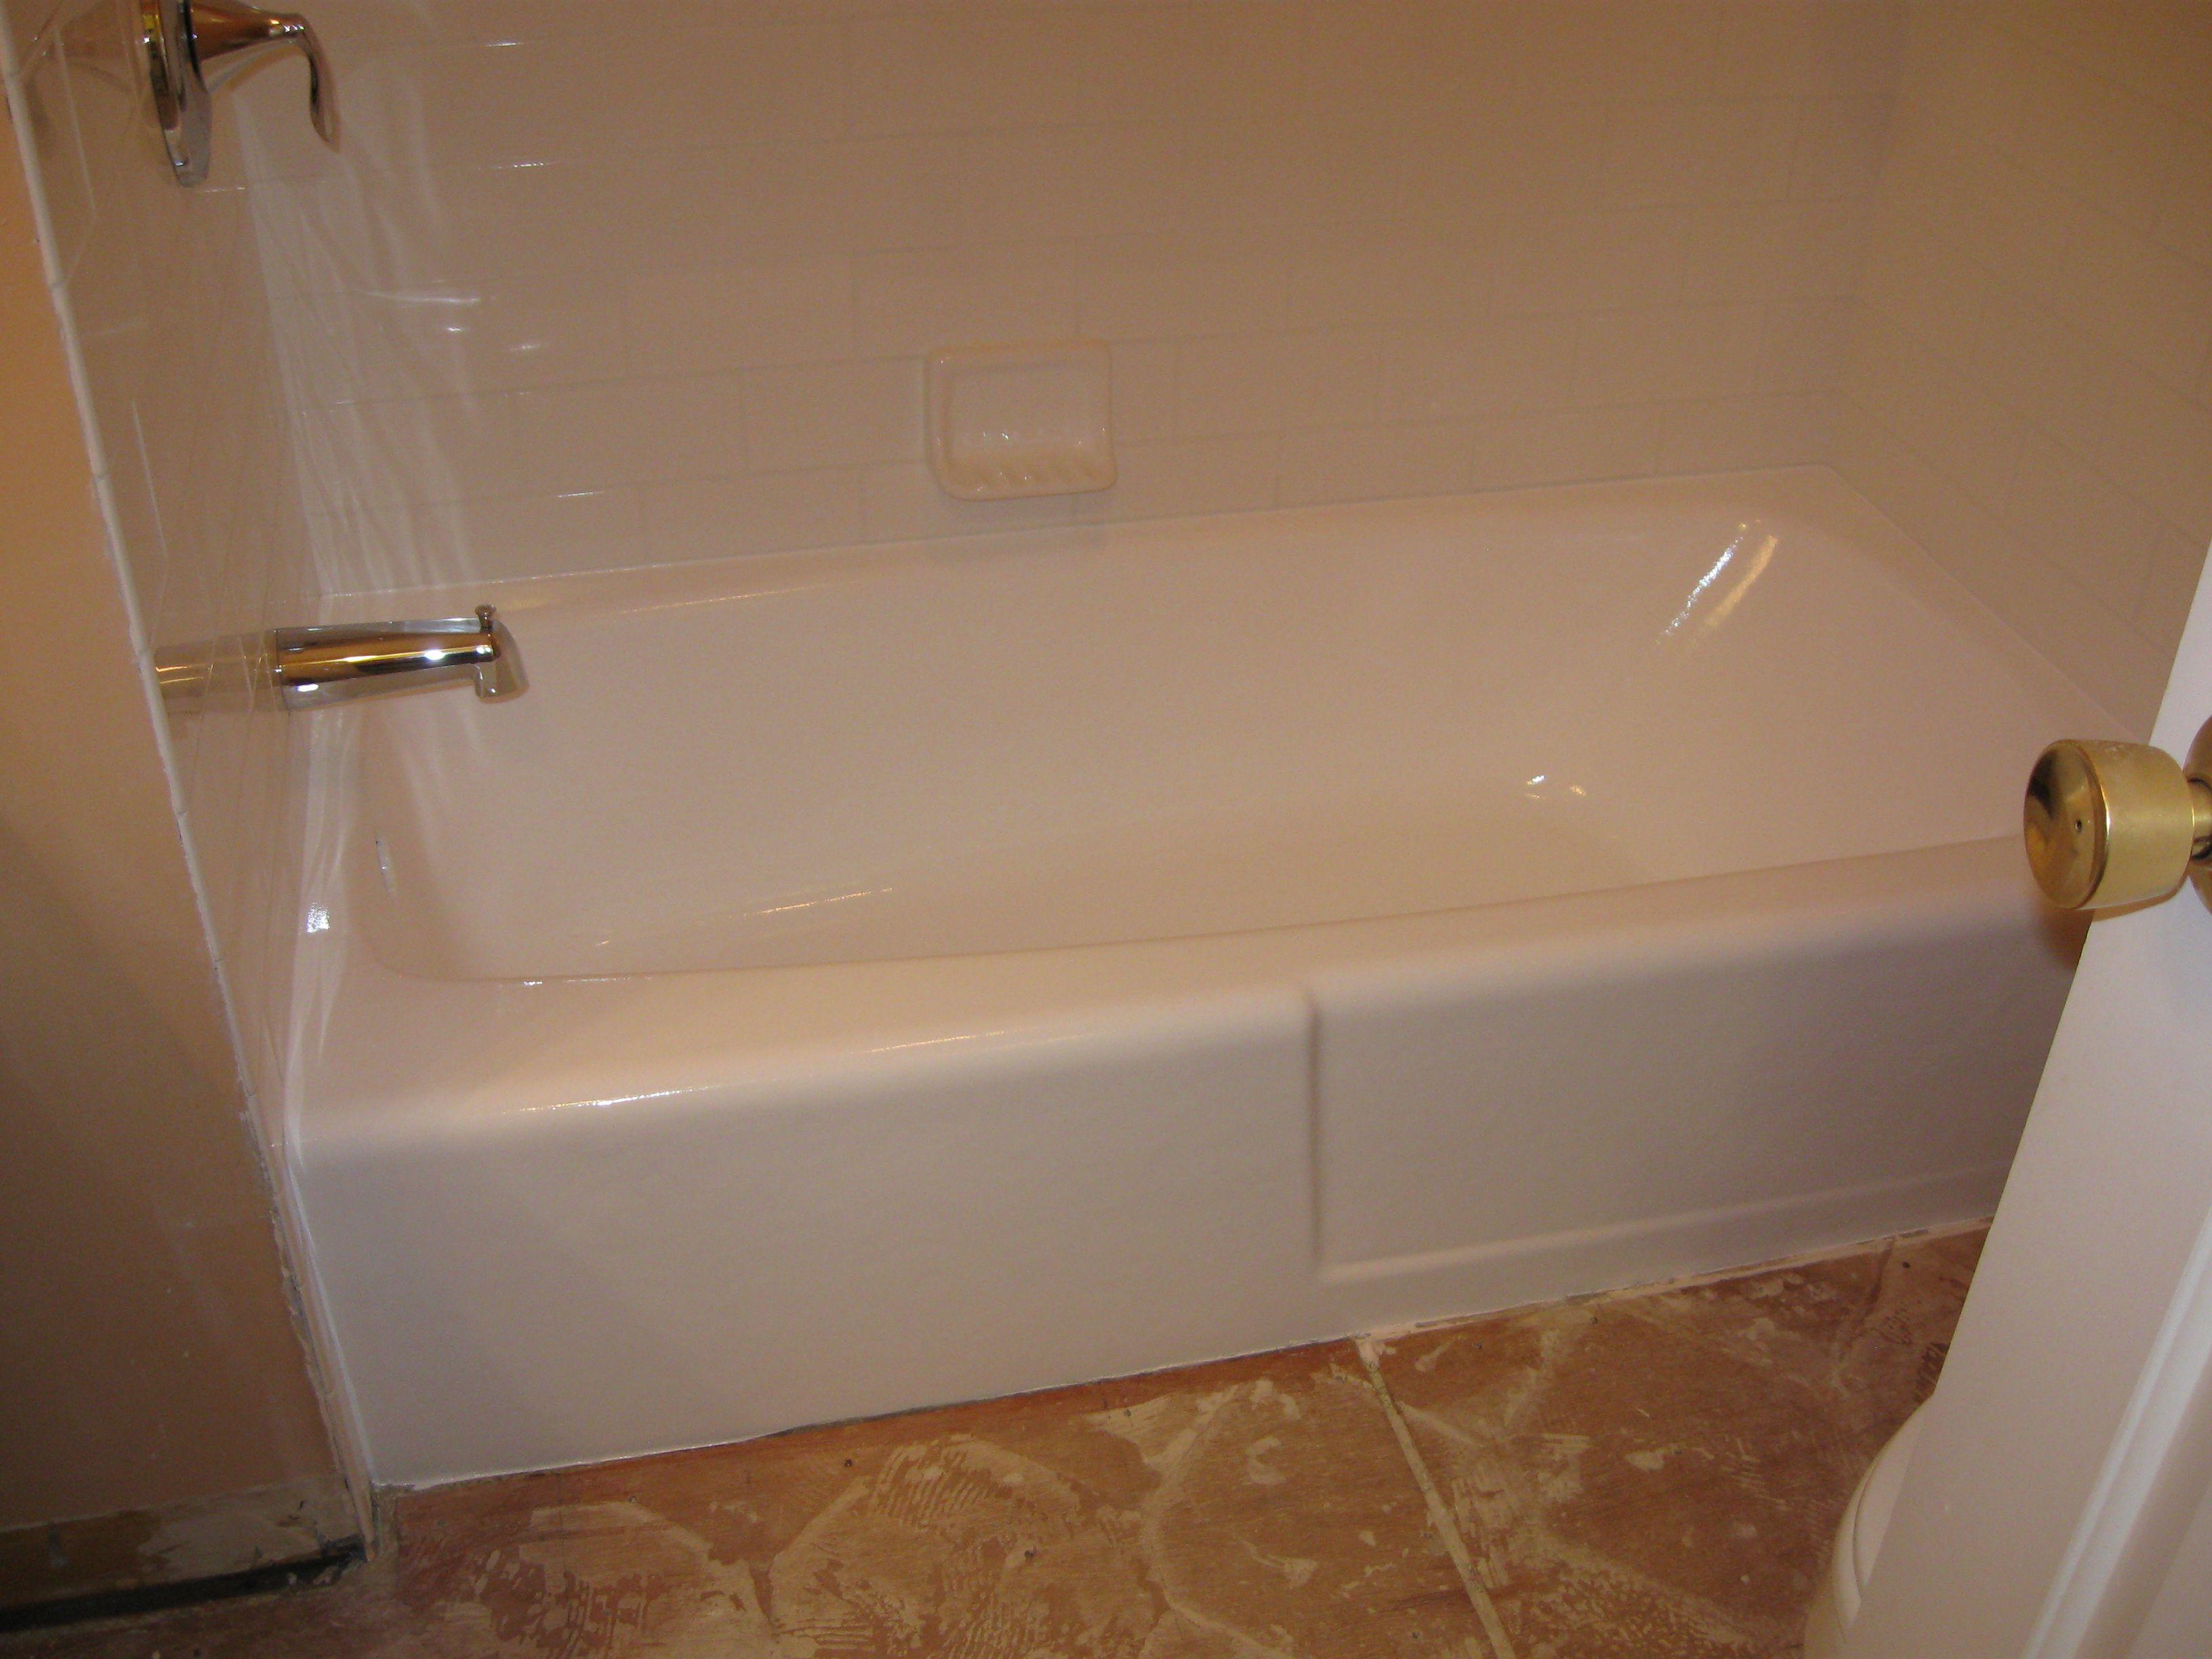 Don T Replace Your Bathtub Refinish Your Bathtub Bathtub Refinishing Is A Cost Effective Alternative To Replacing Refinish Bathtub Bathtub Home Maintenance